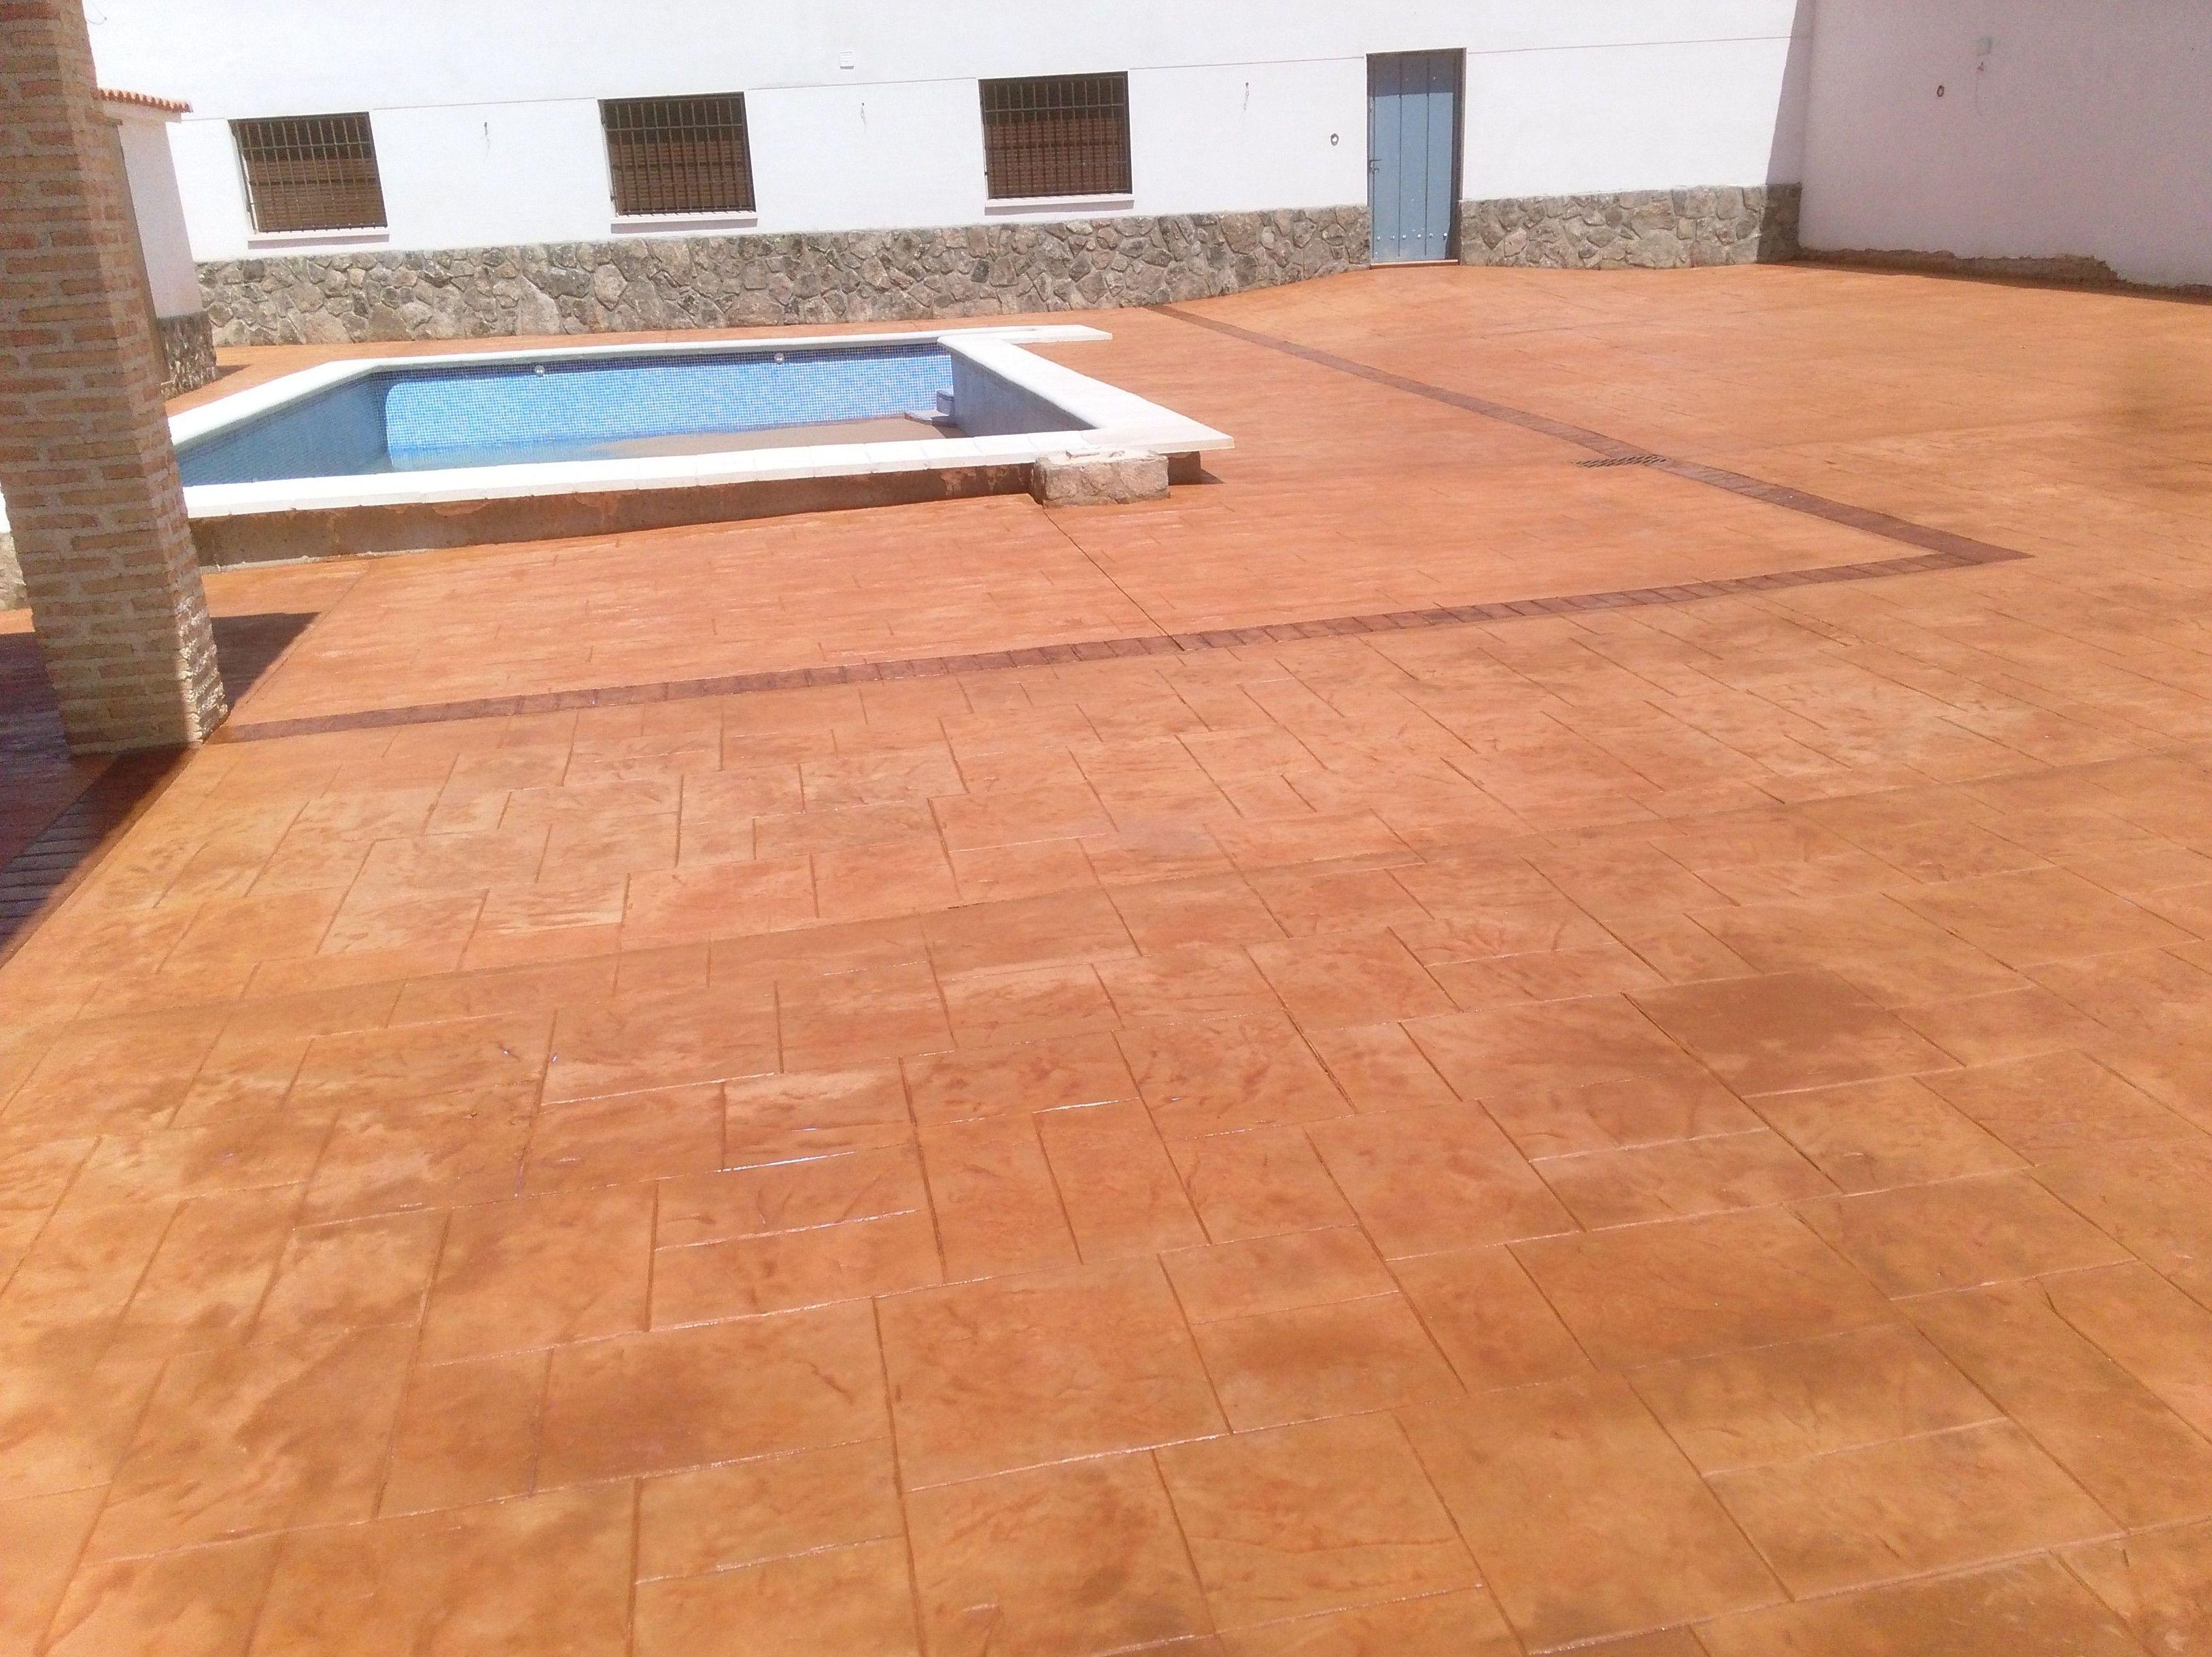 Foto 17 de Pavimentos pulidos en Talavera de la Reina | Pavimpresos Talavera